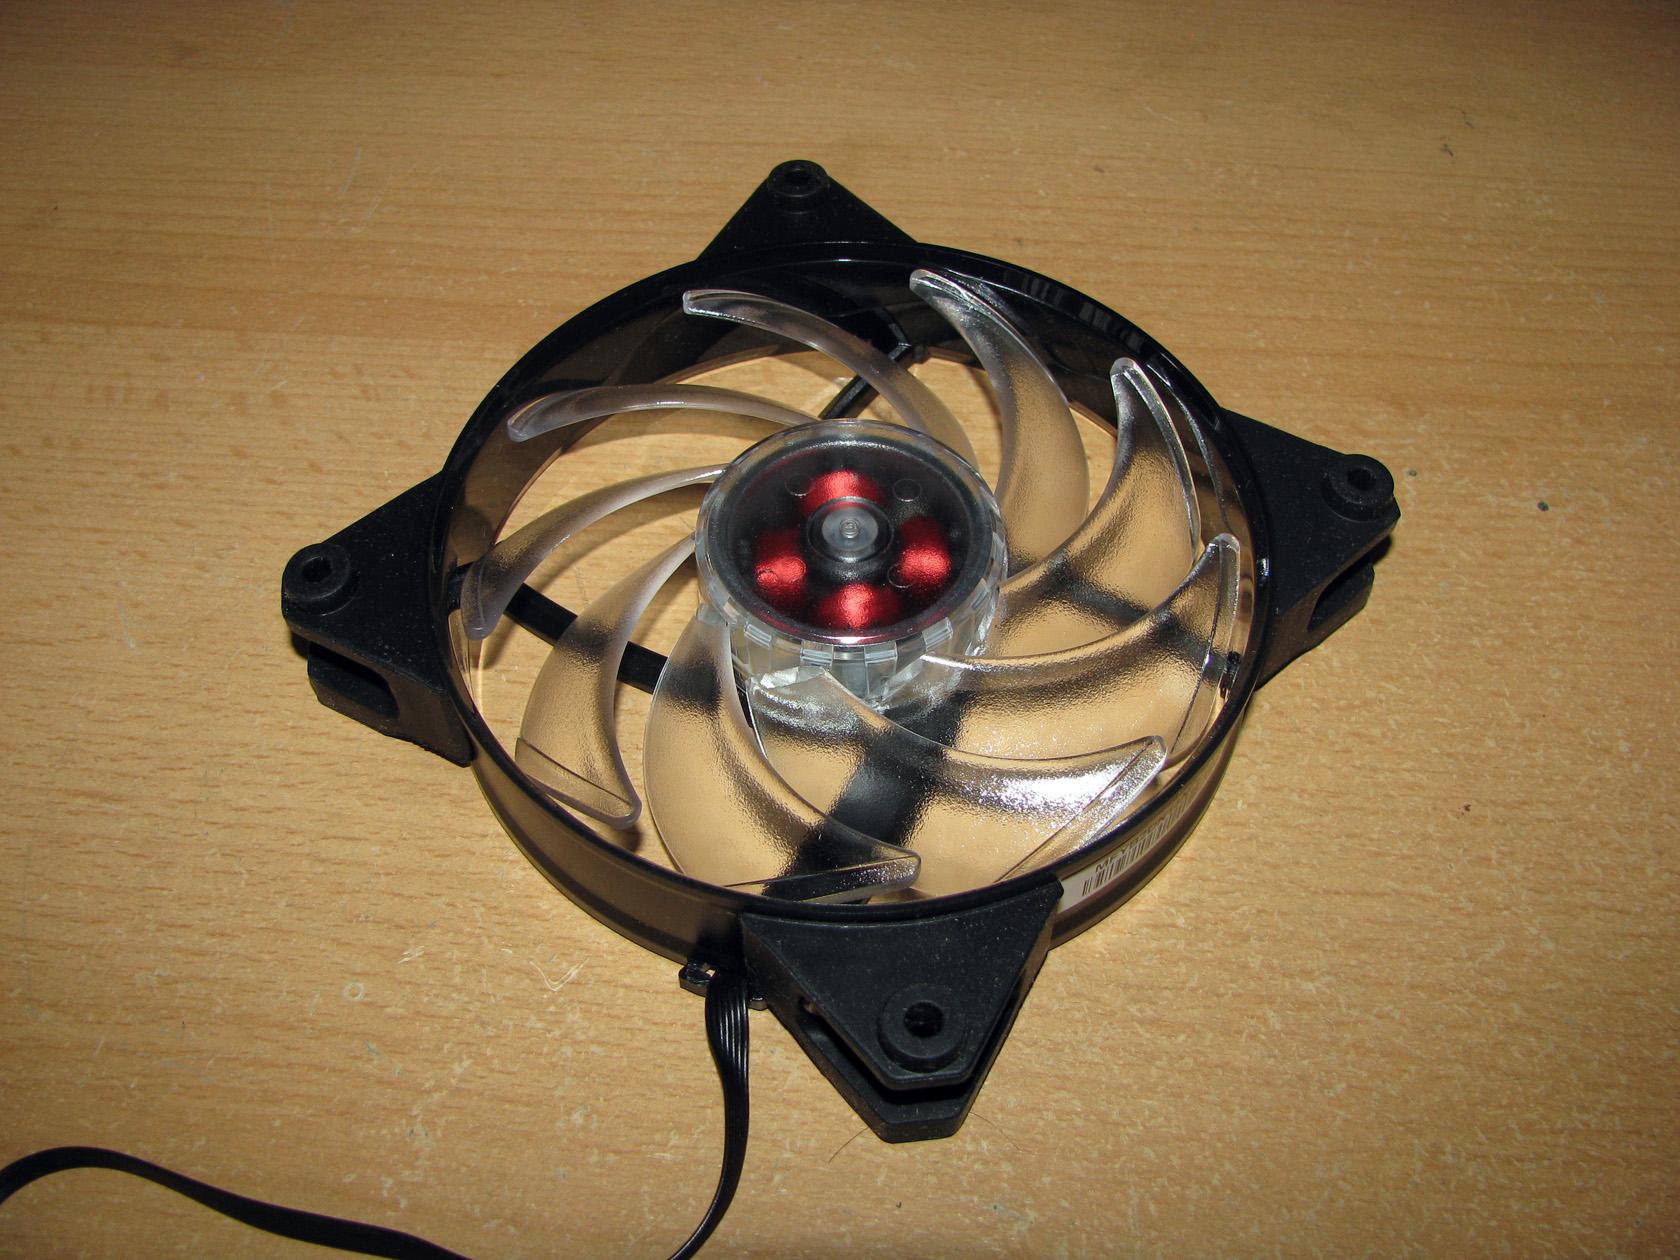 Cooler Master MasterFan Pro 120 Air Balance RGB and Pro 140 Air